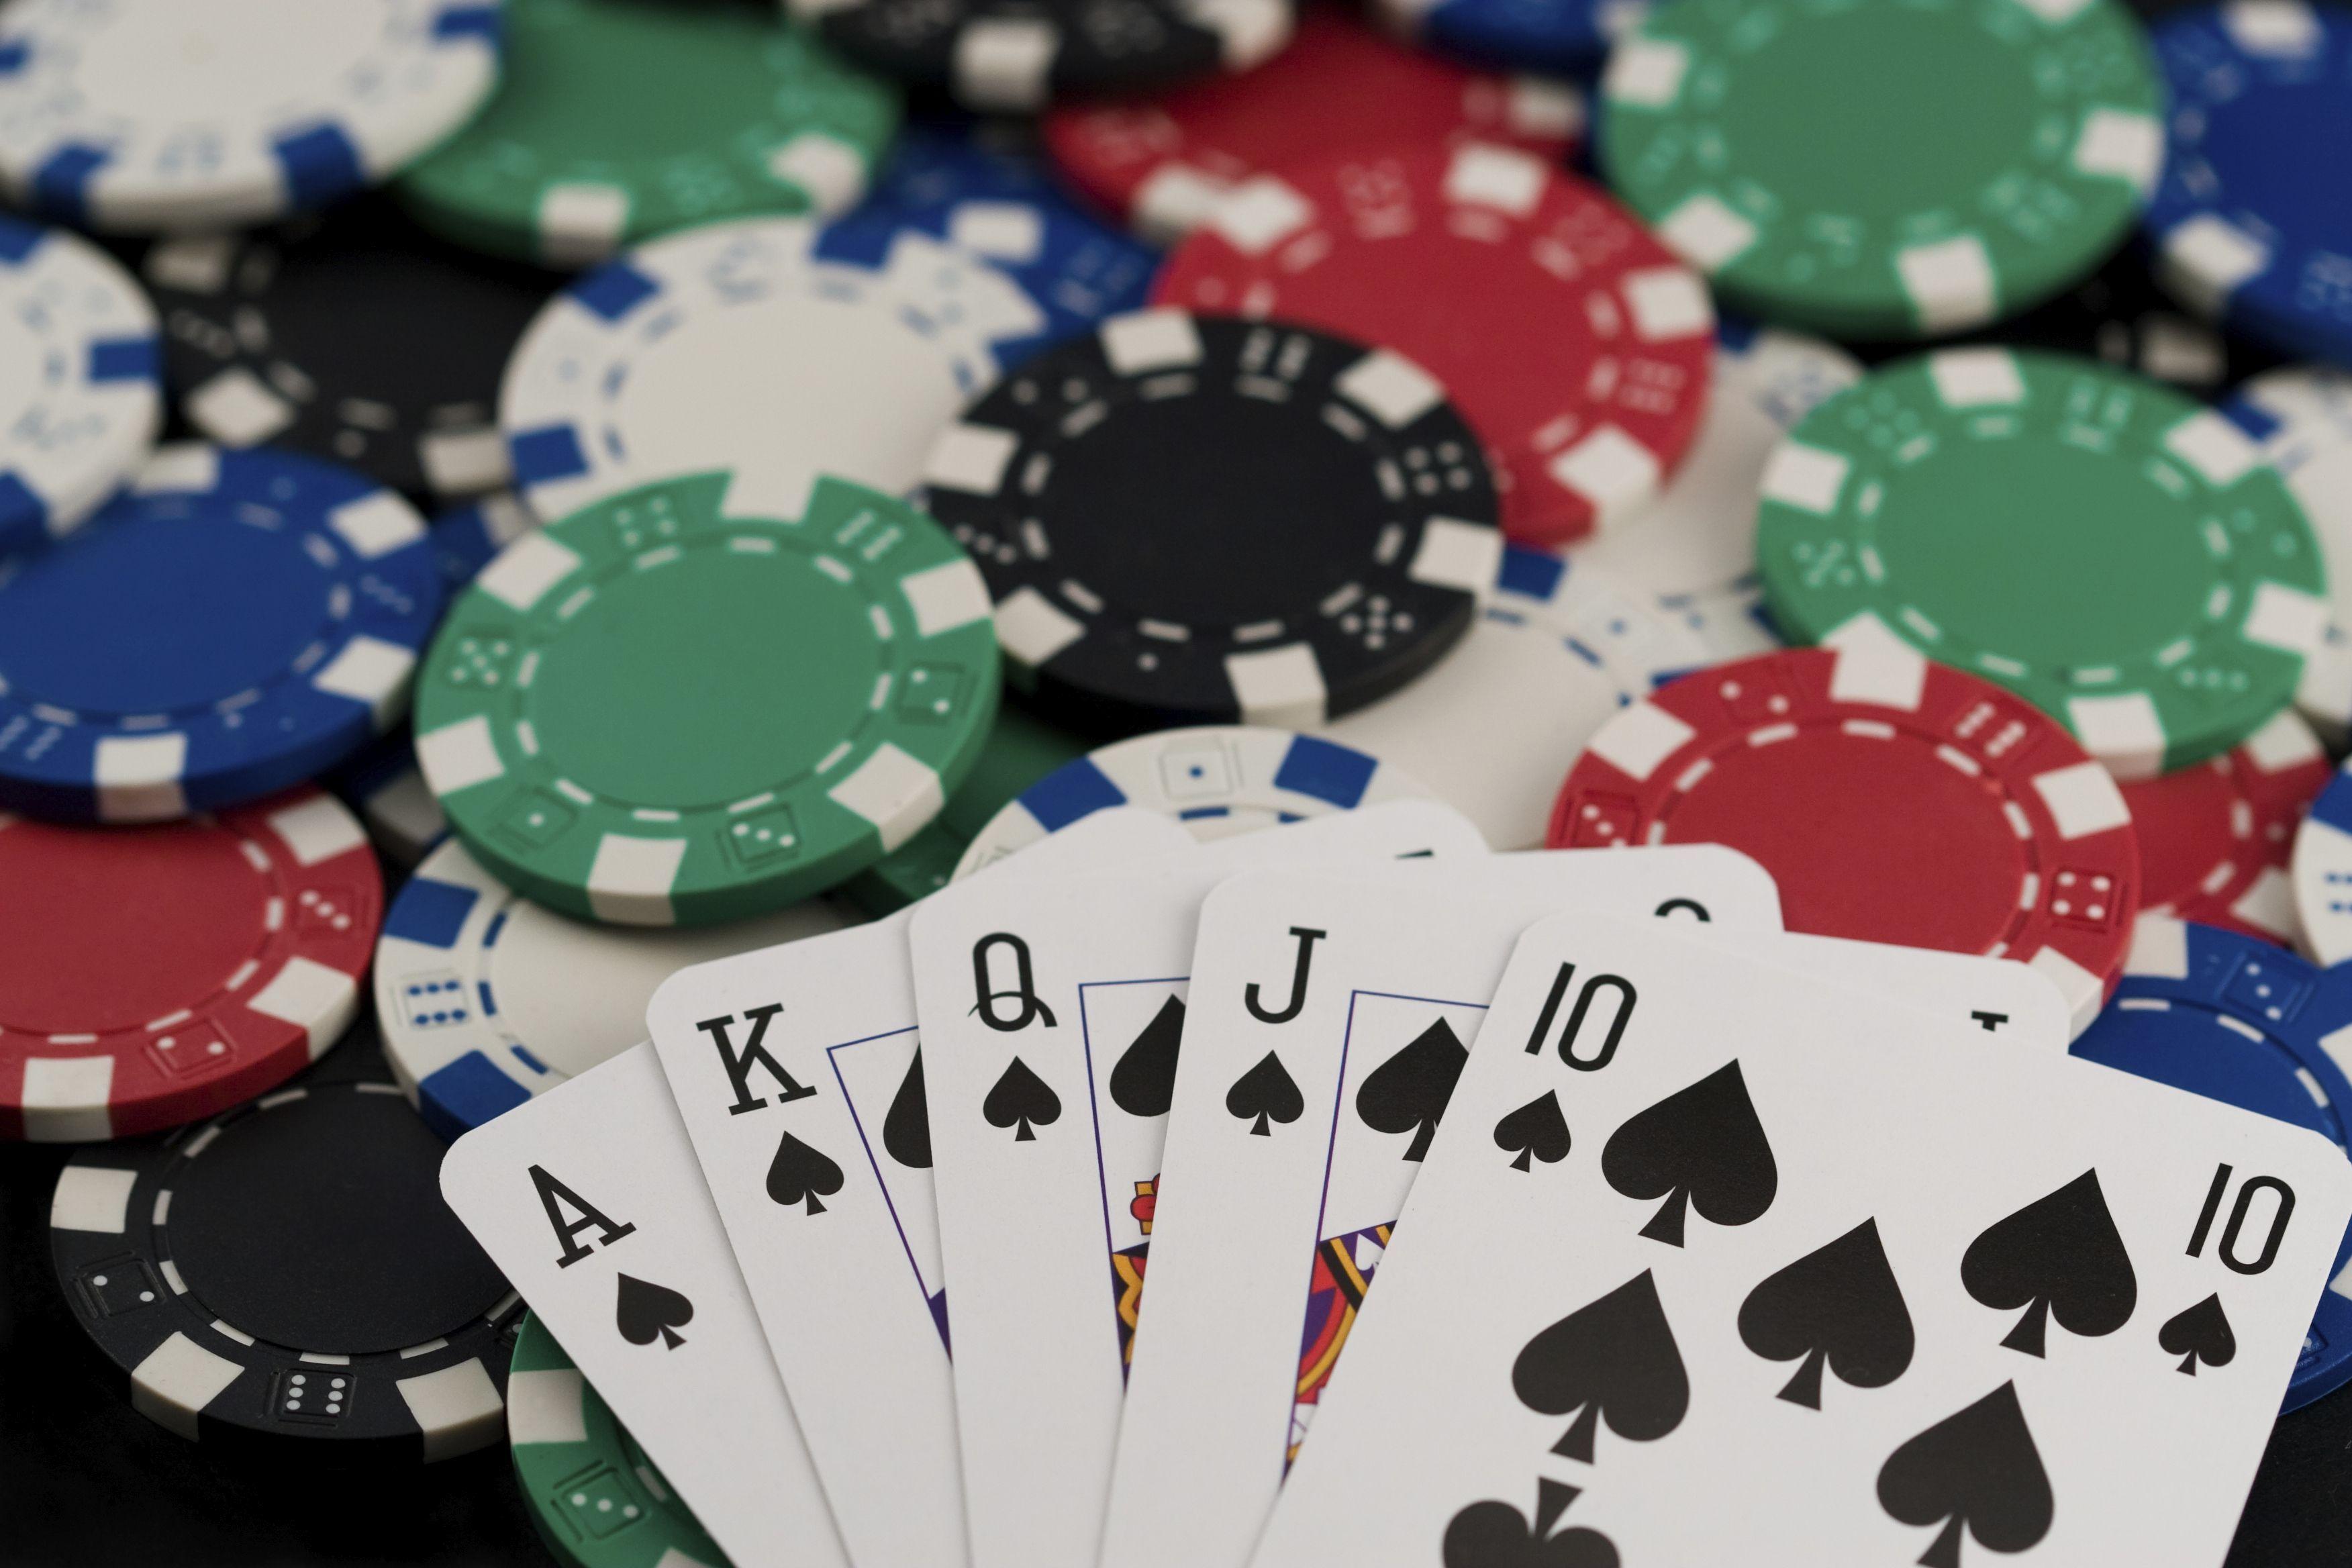 Pokerstars heads up holdem casino